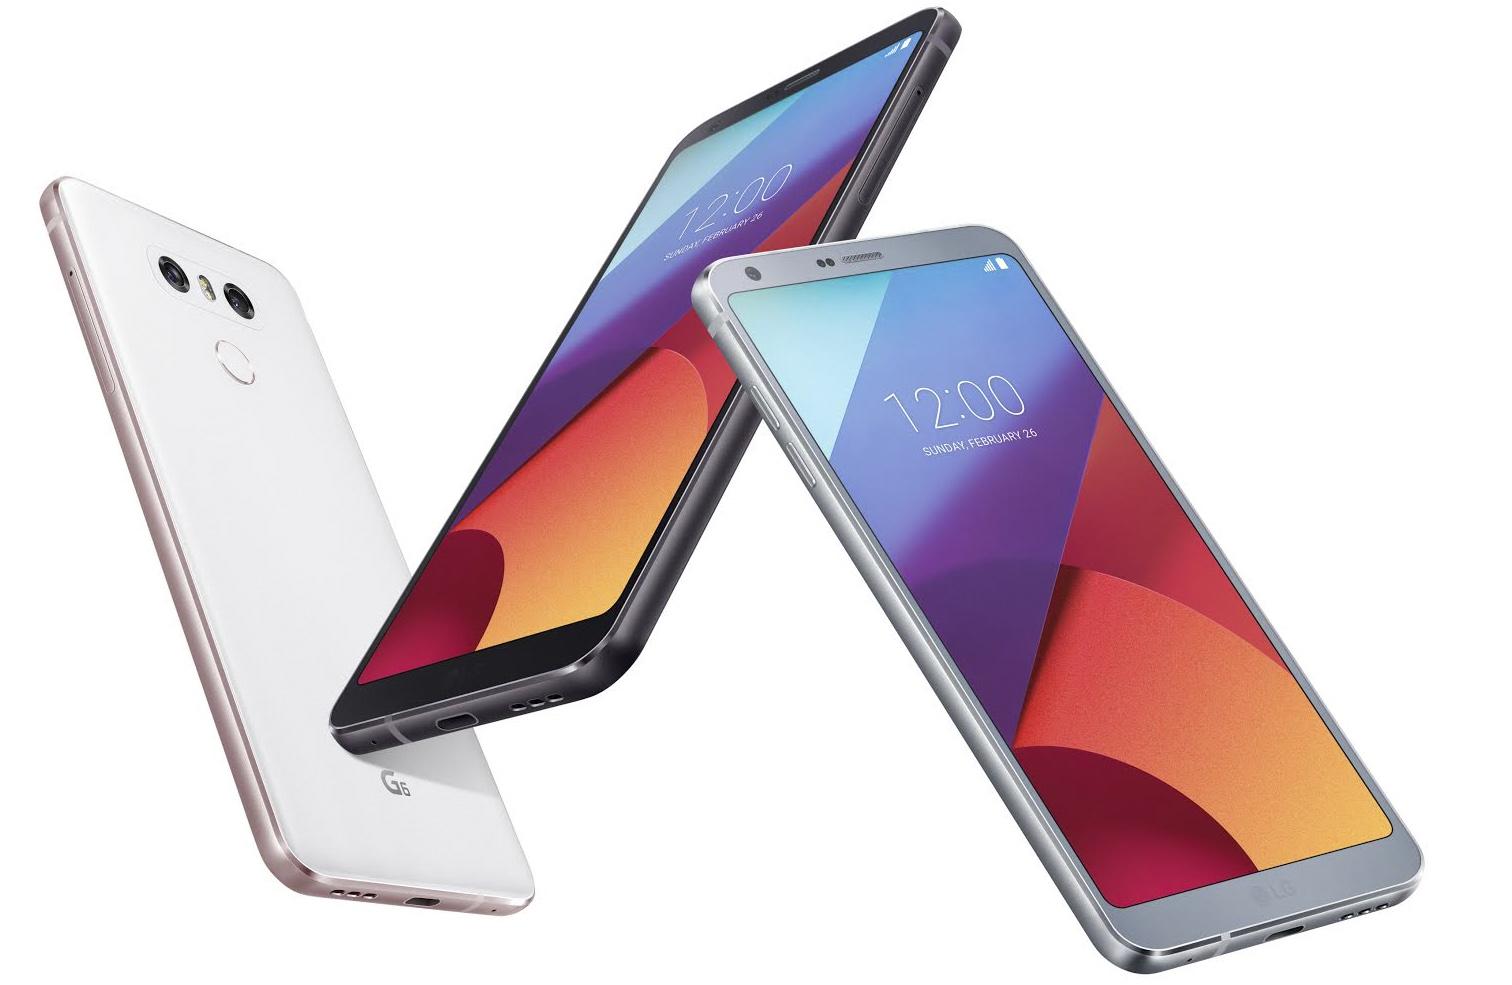 Colores en LG G6